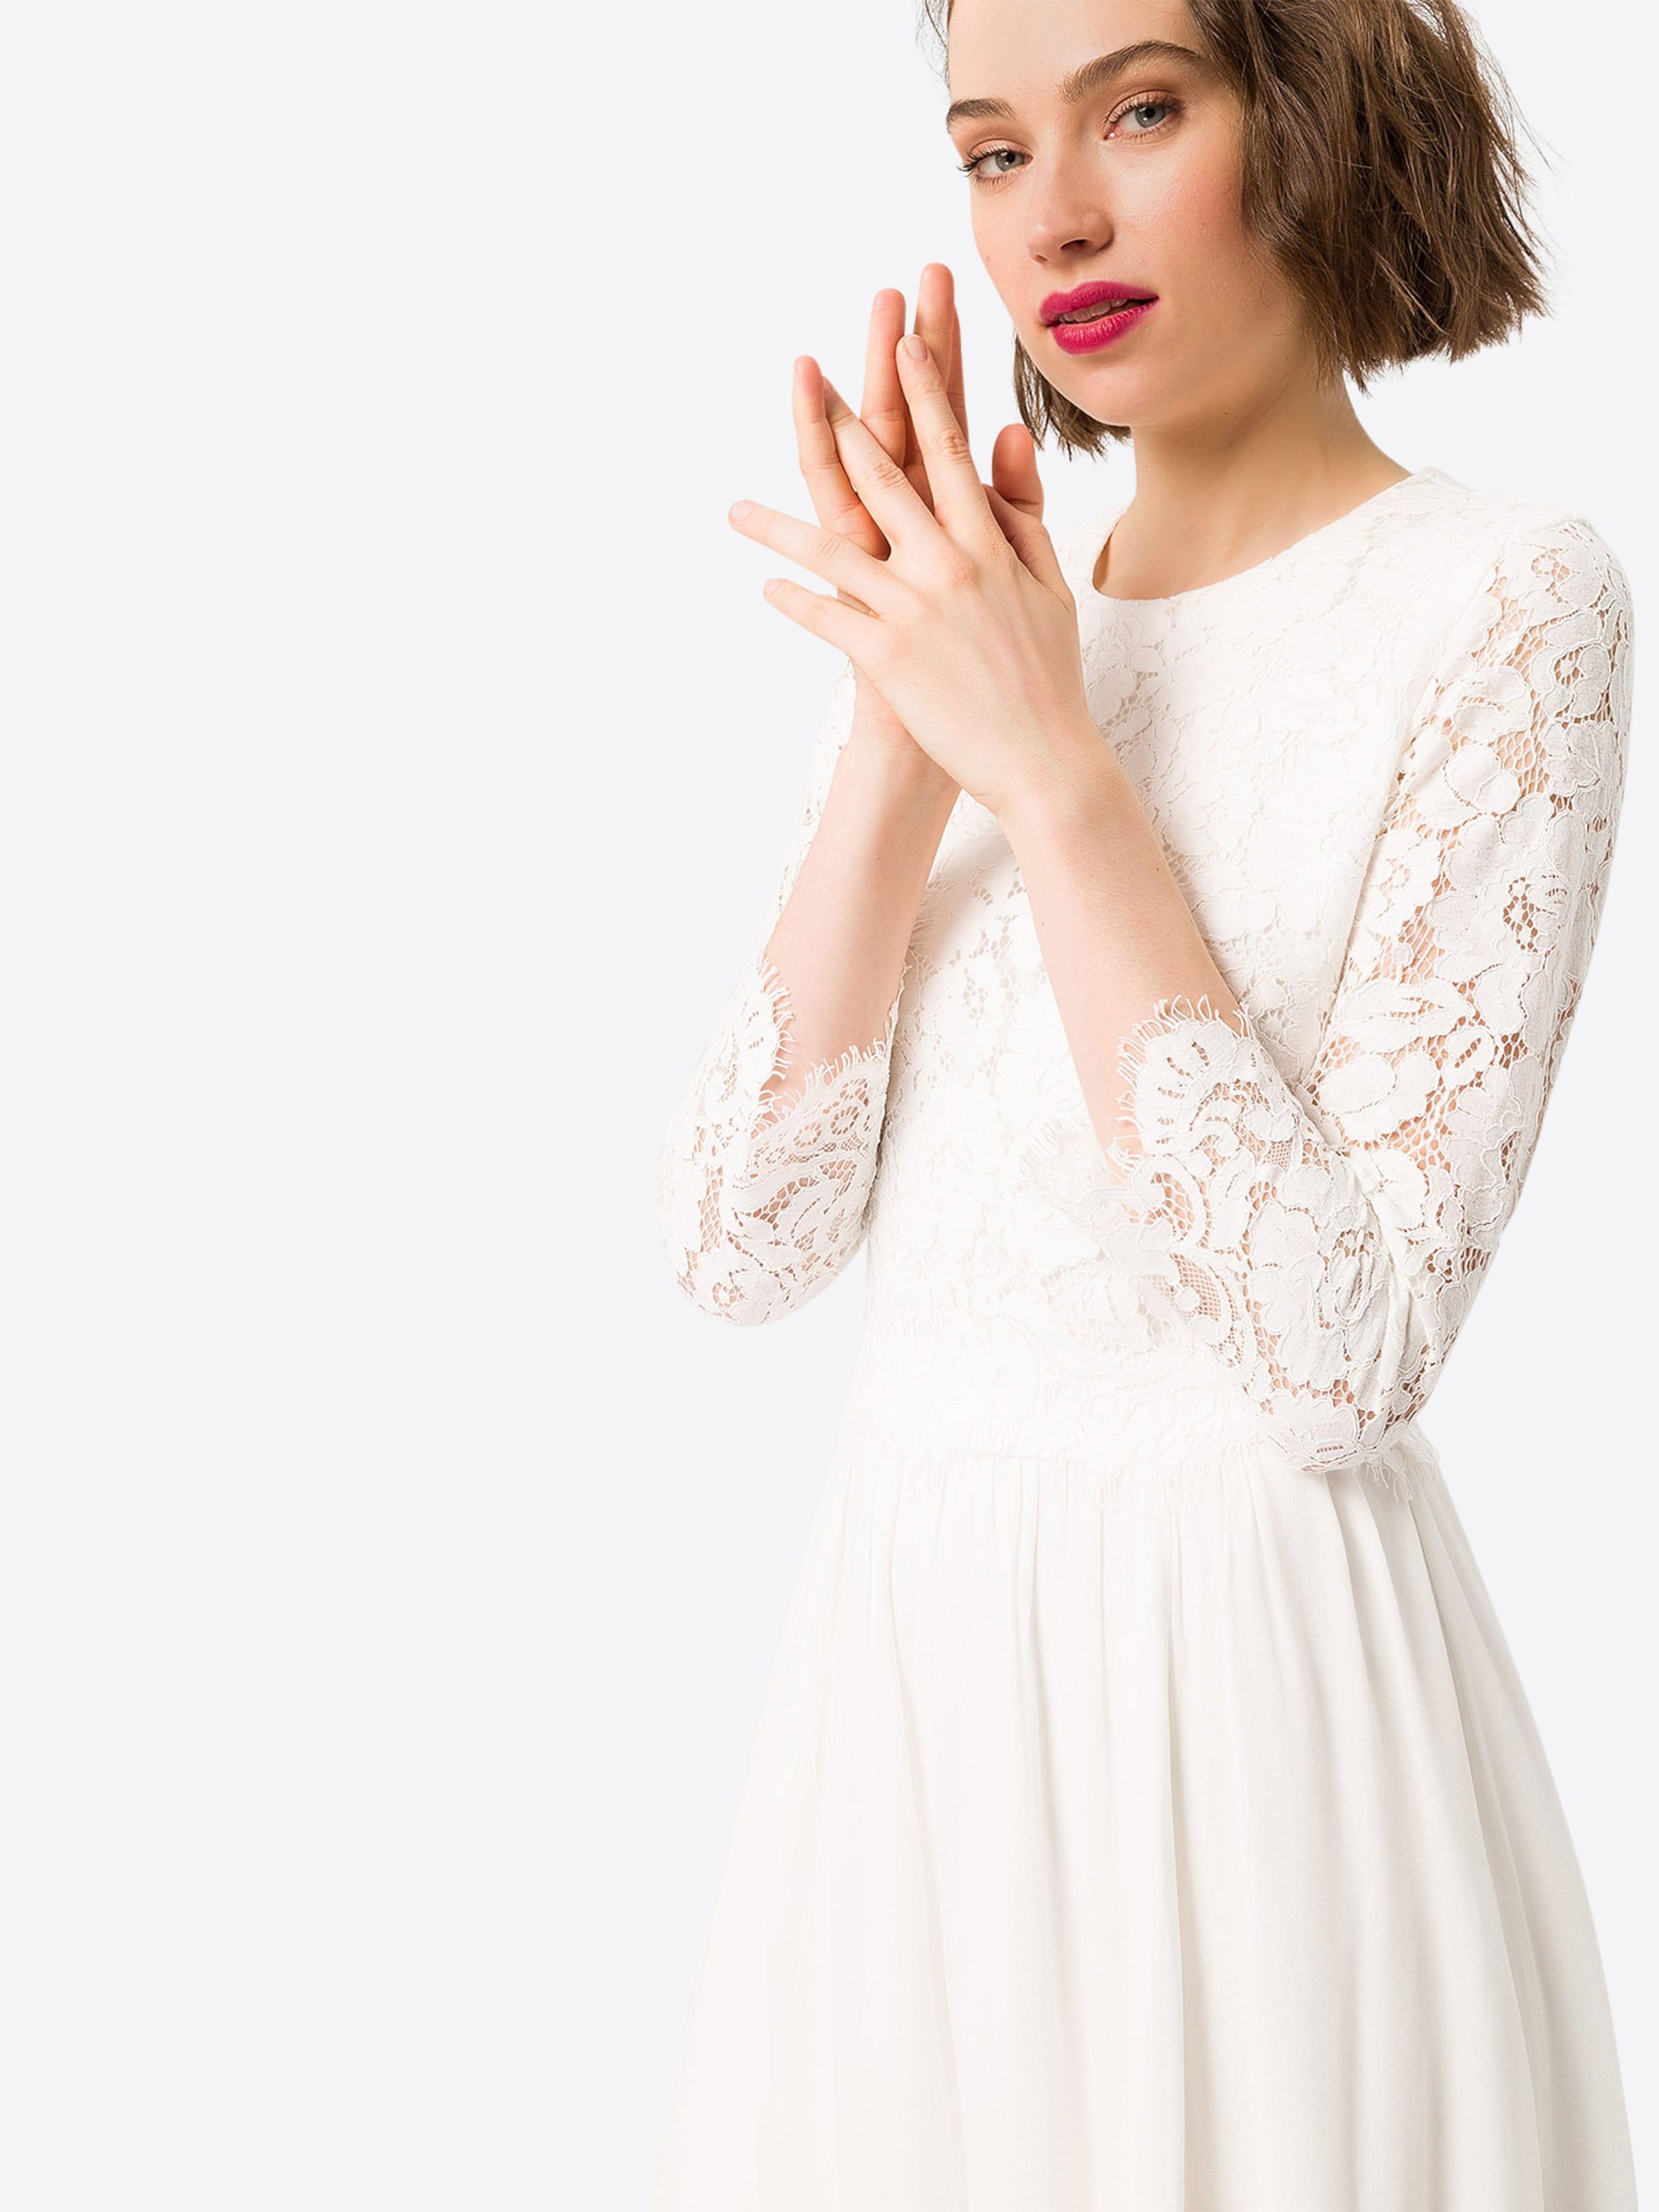 2in1 Robe Soirée Blanc 'bridal Oak En De Maxi' Ivyamp; tQrChosxBd